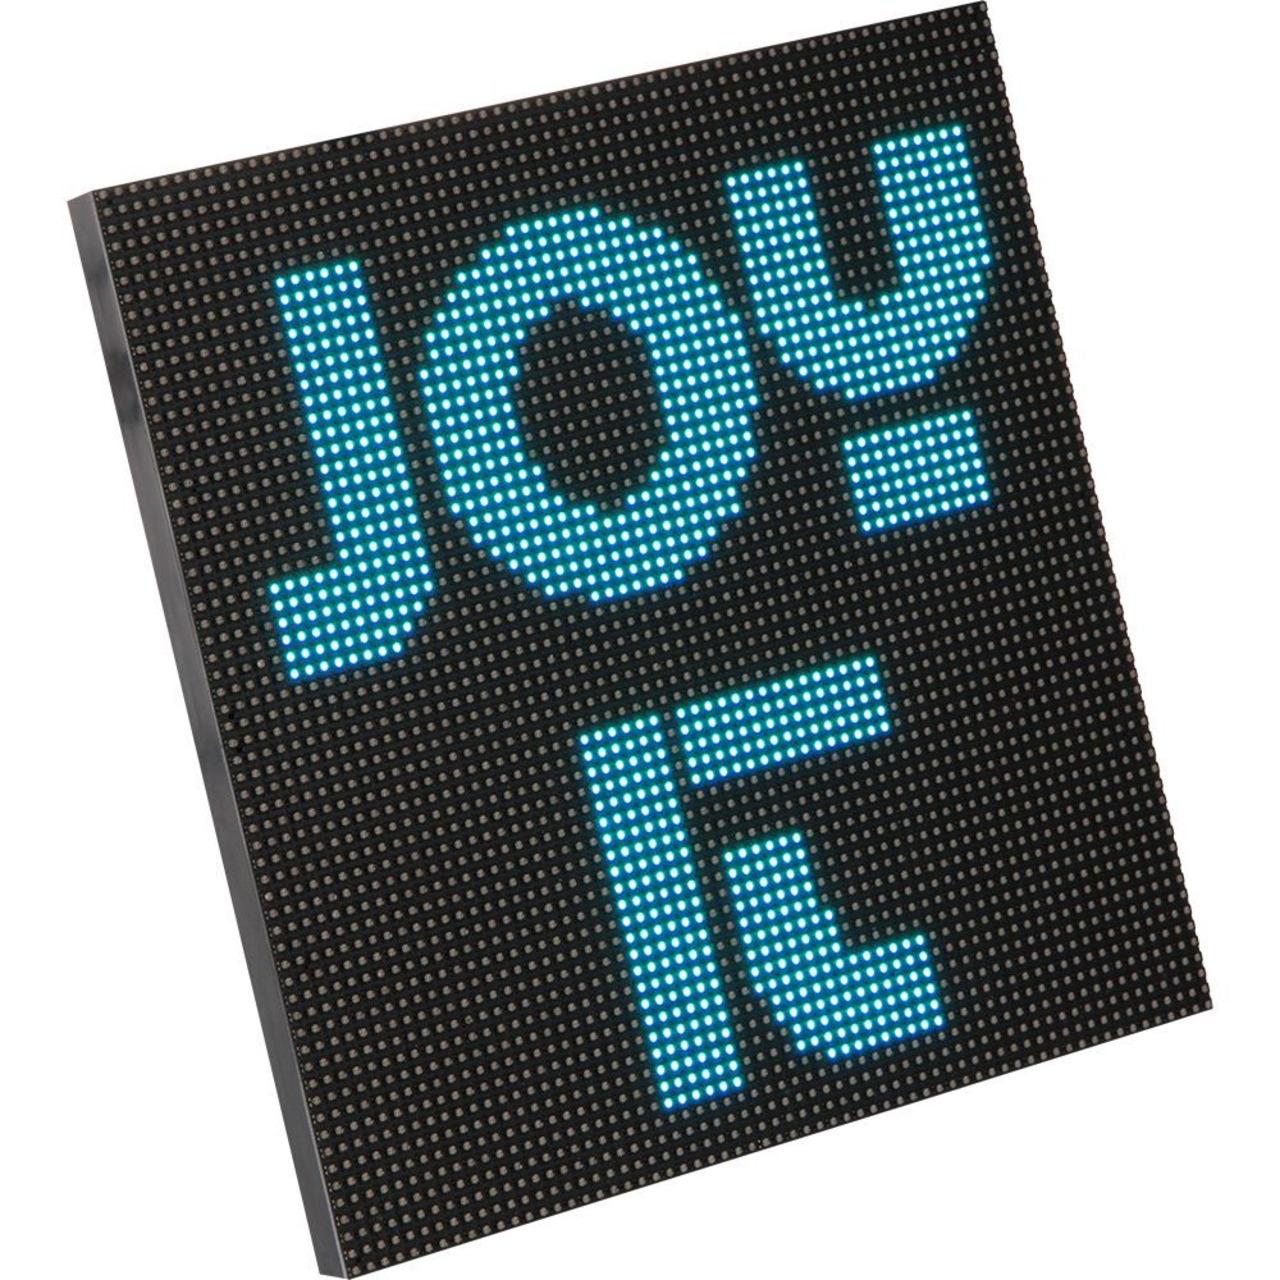 Joy-IT RGB-LED-Matrix-Modul 64x64 fund-252 r Raspberry Pi- Arduino- Banana Pi- mirco:bit